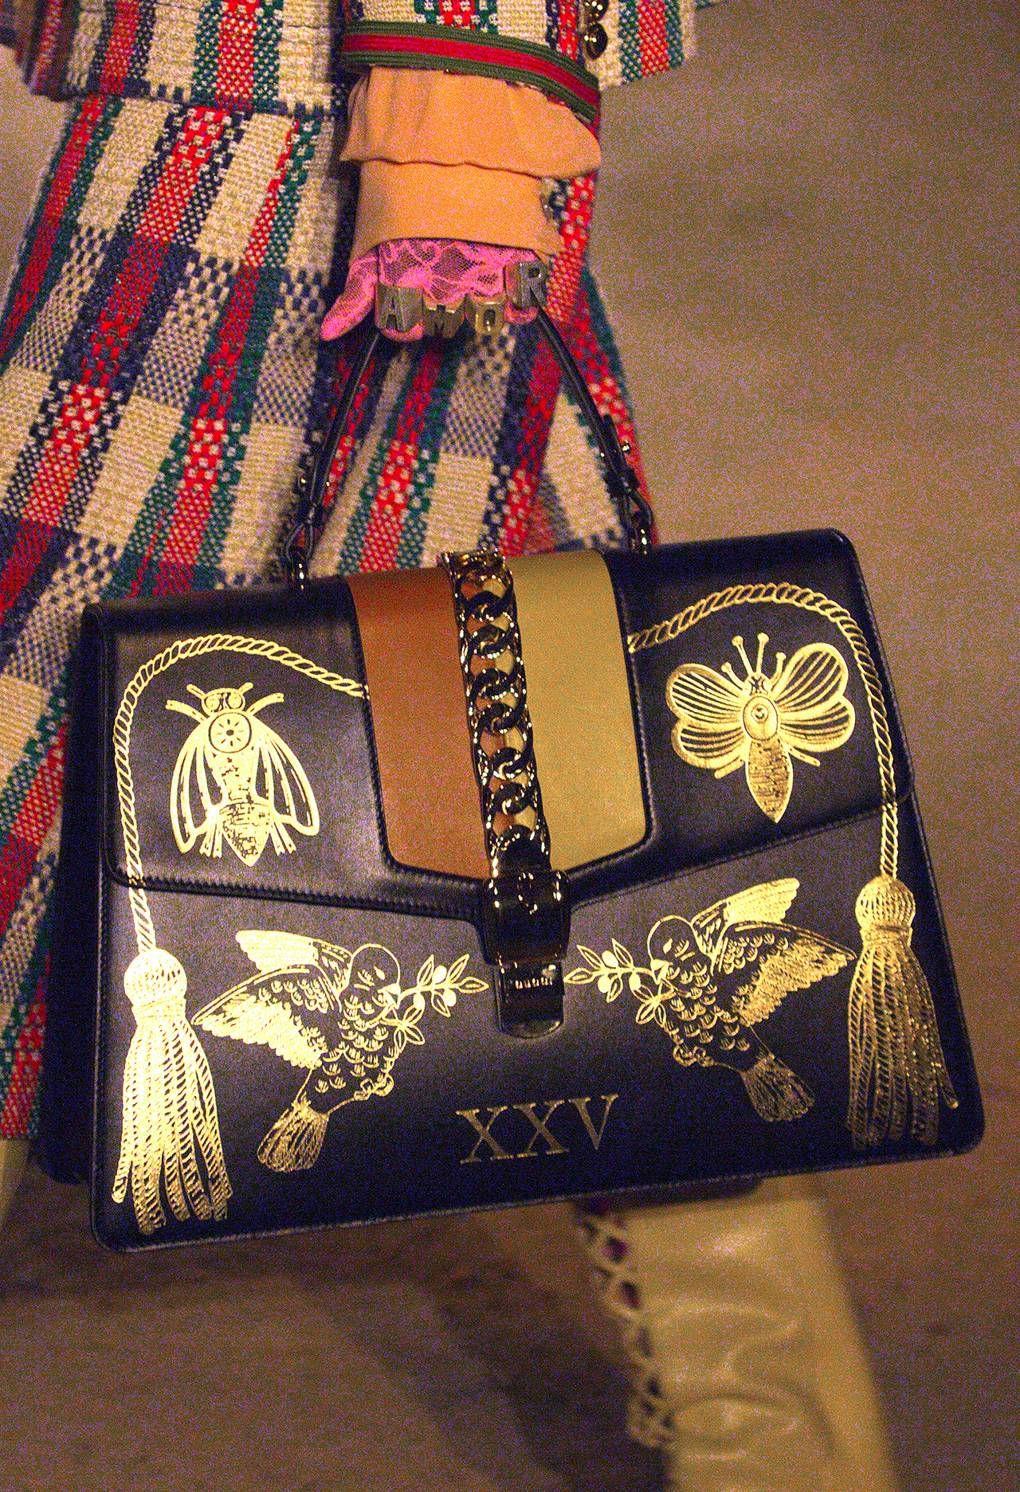 b82ae8704cad Gucci fashion show Details - via theimpression site